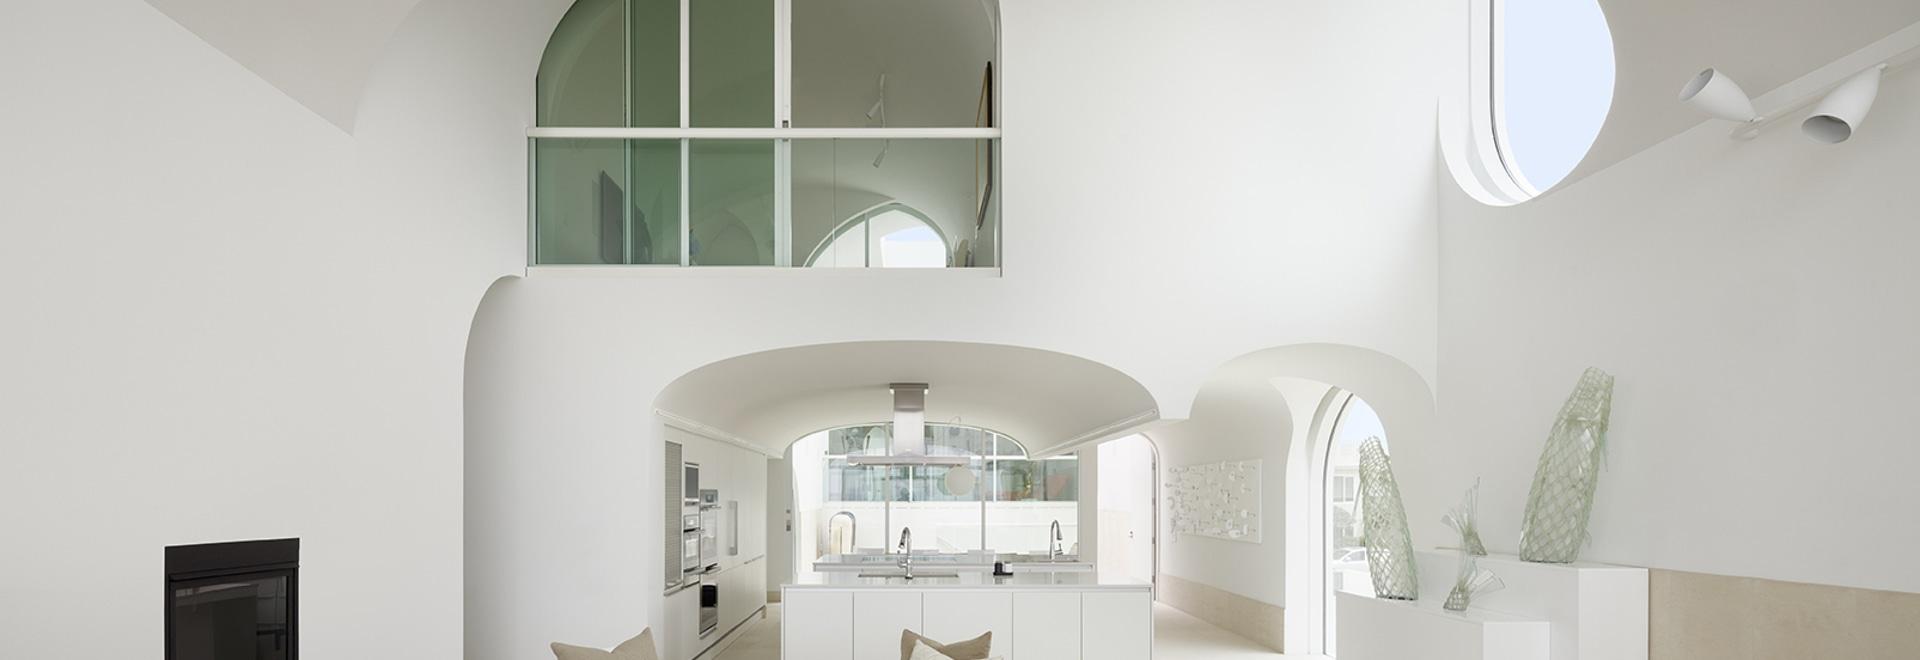 Outstanding Vault House Oxnard Ca Usa Download Free Architecture Designs Scobabritishbridgeorg